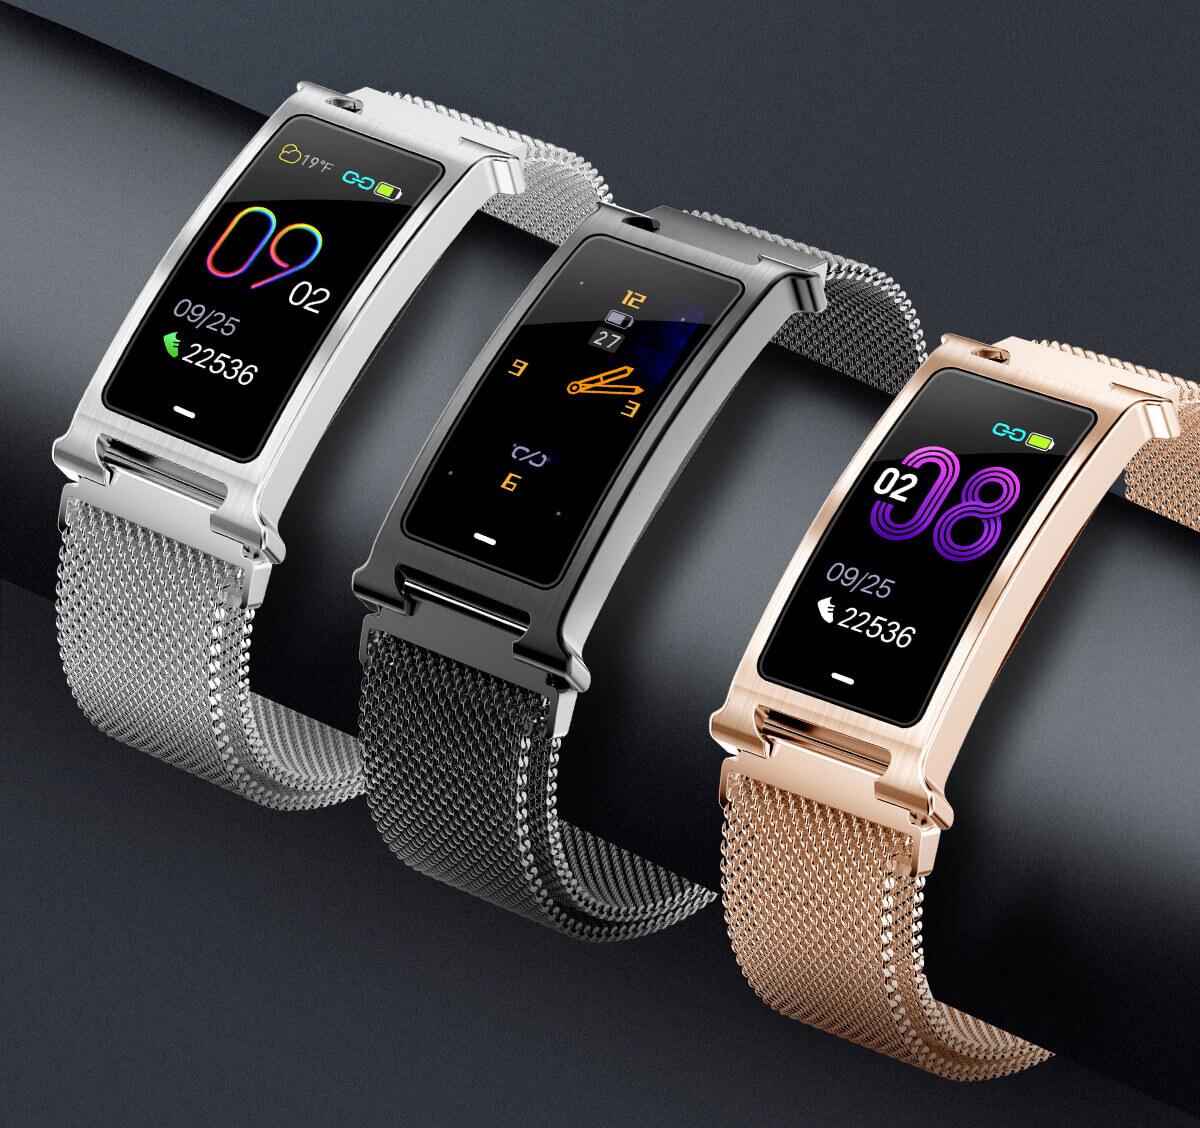 Chytrý kovový fitness náramek Smartomat Silentband 2 chytré hodinky 3